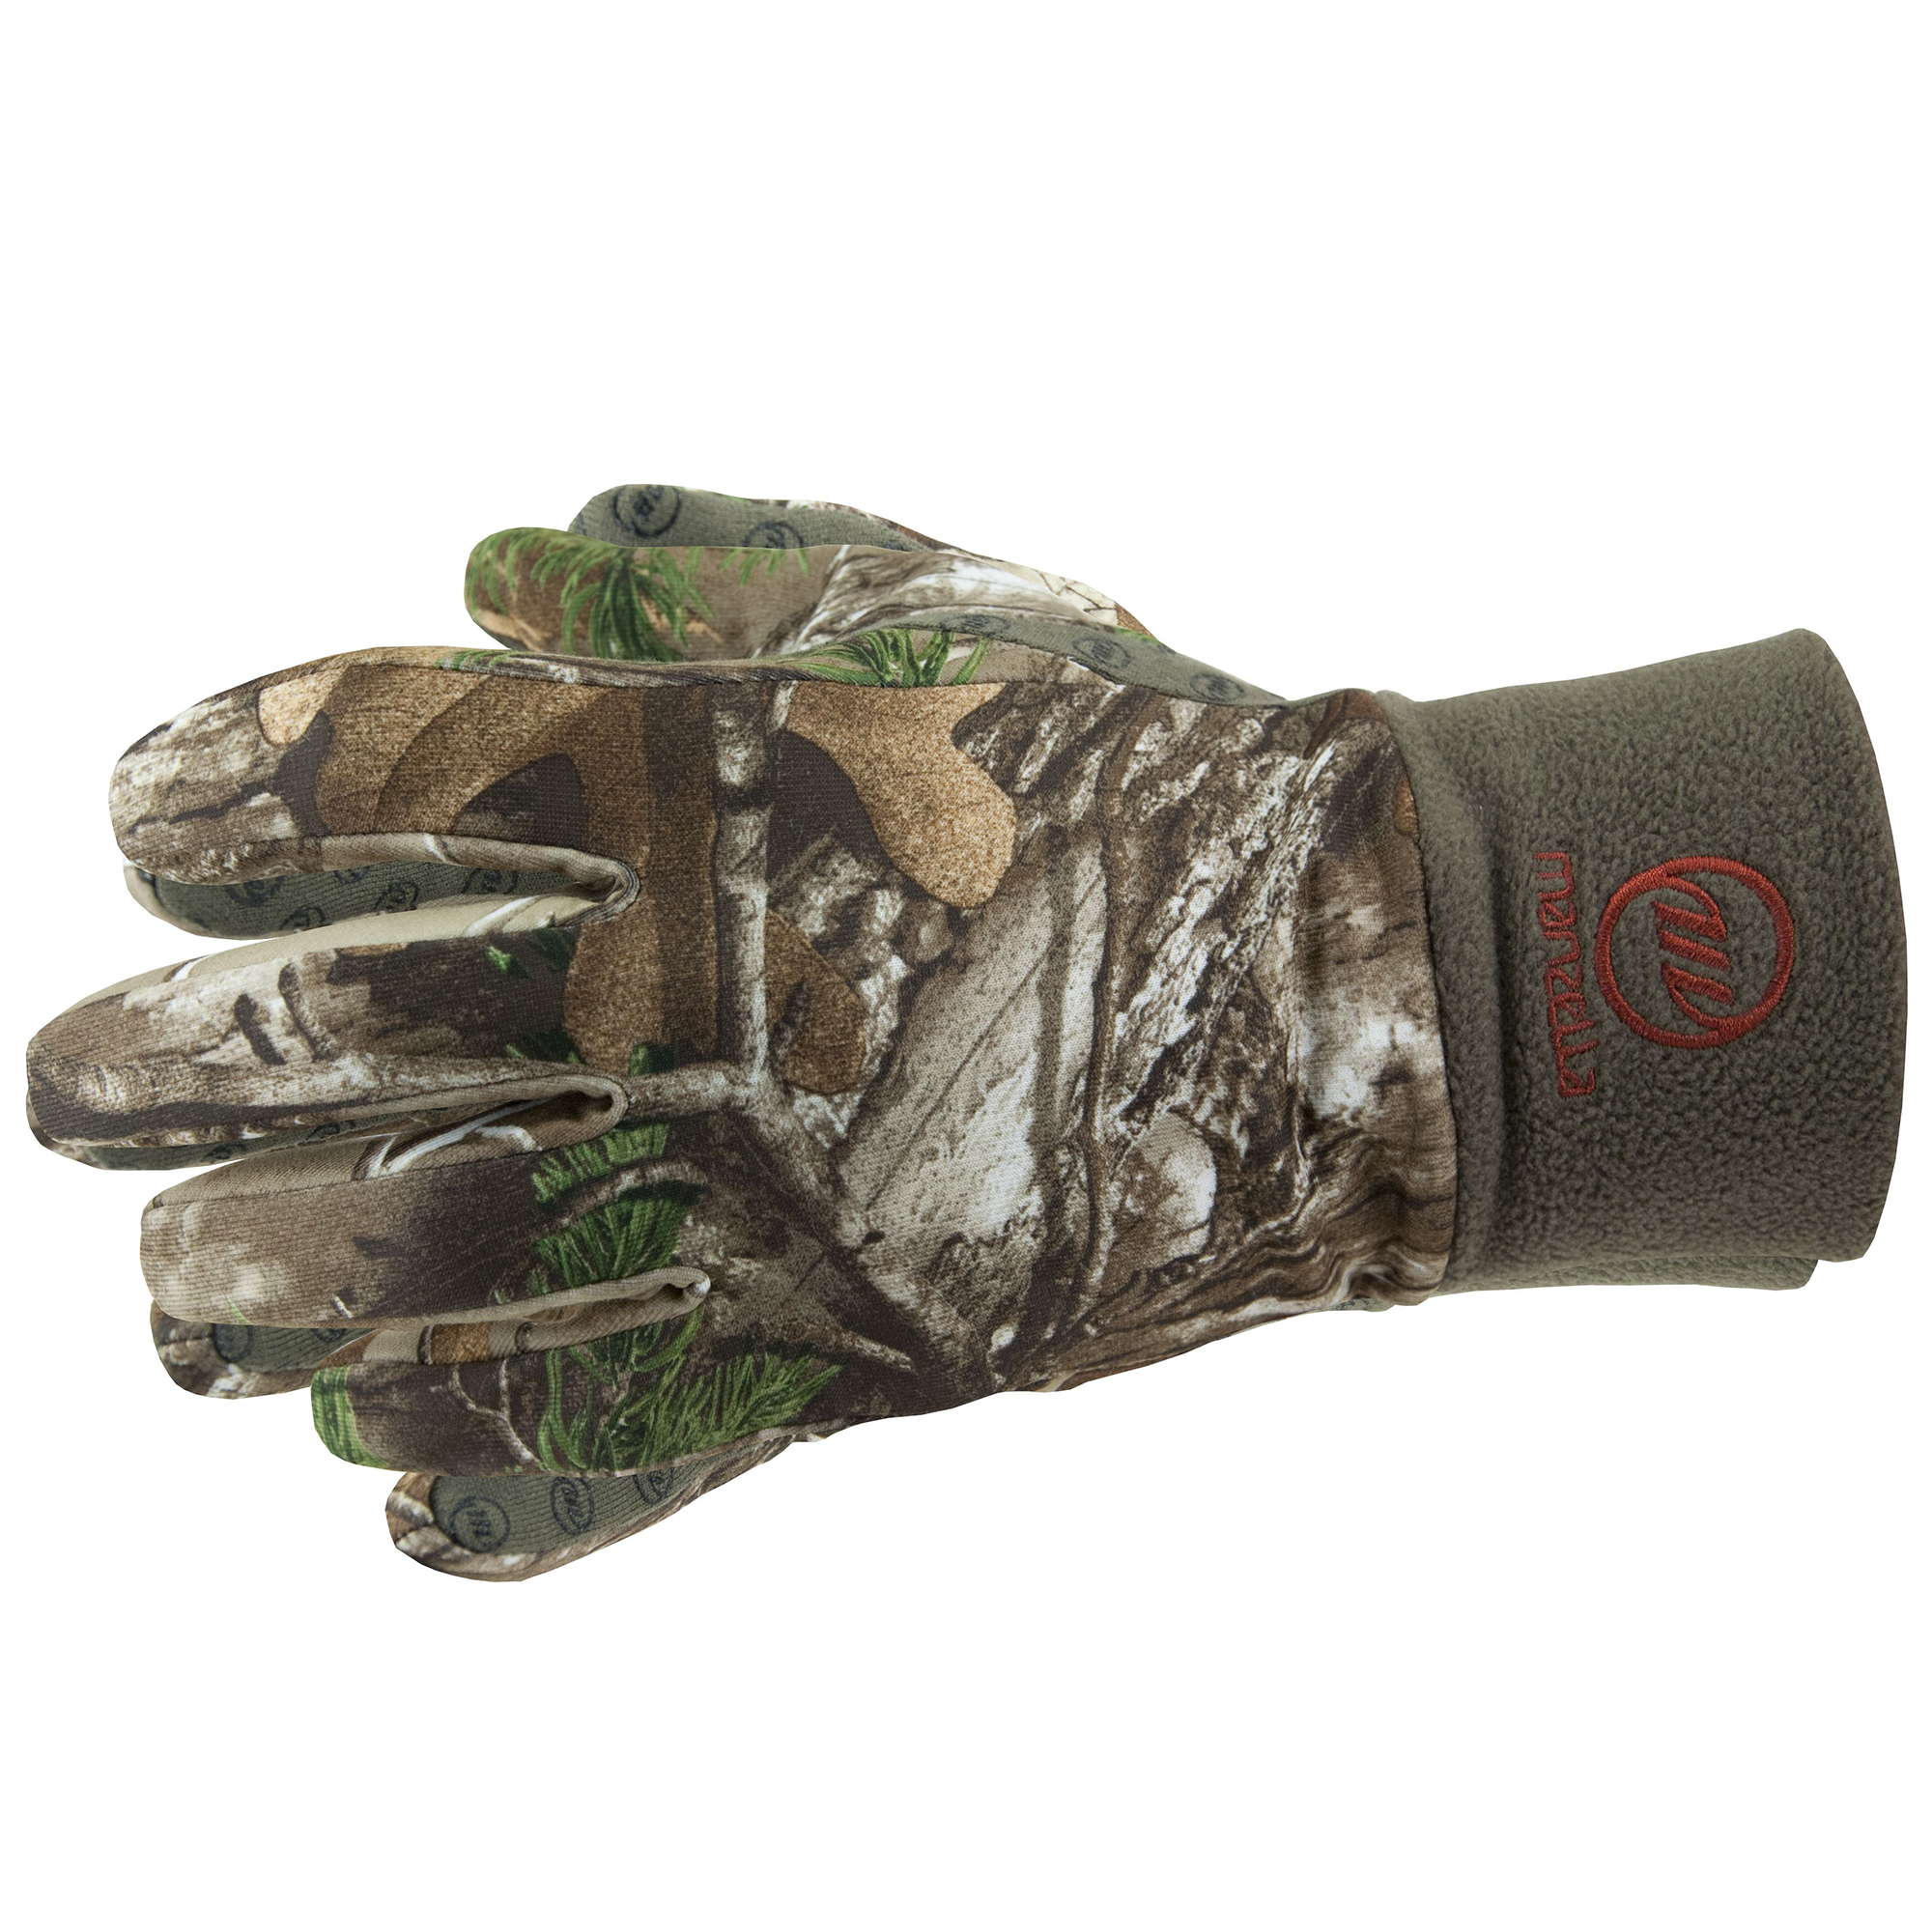 Manzella Men's Ranger Hunting Glove thumbnail